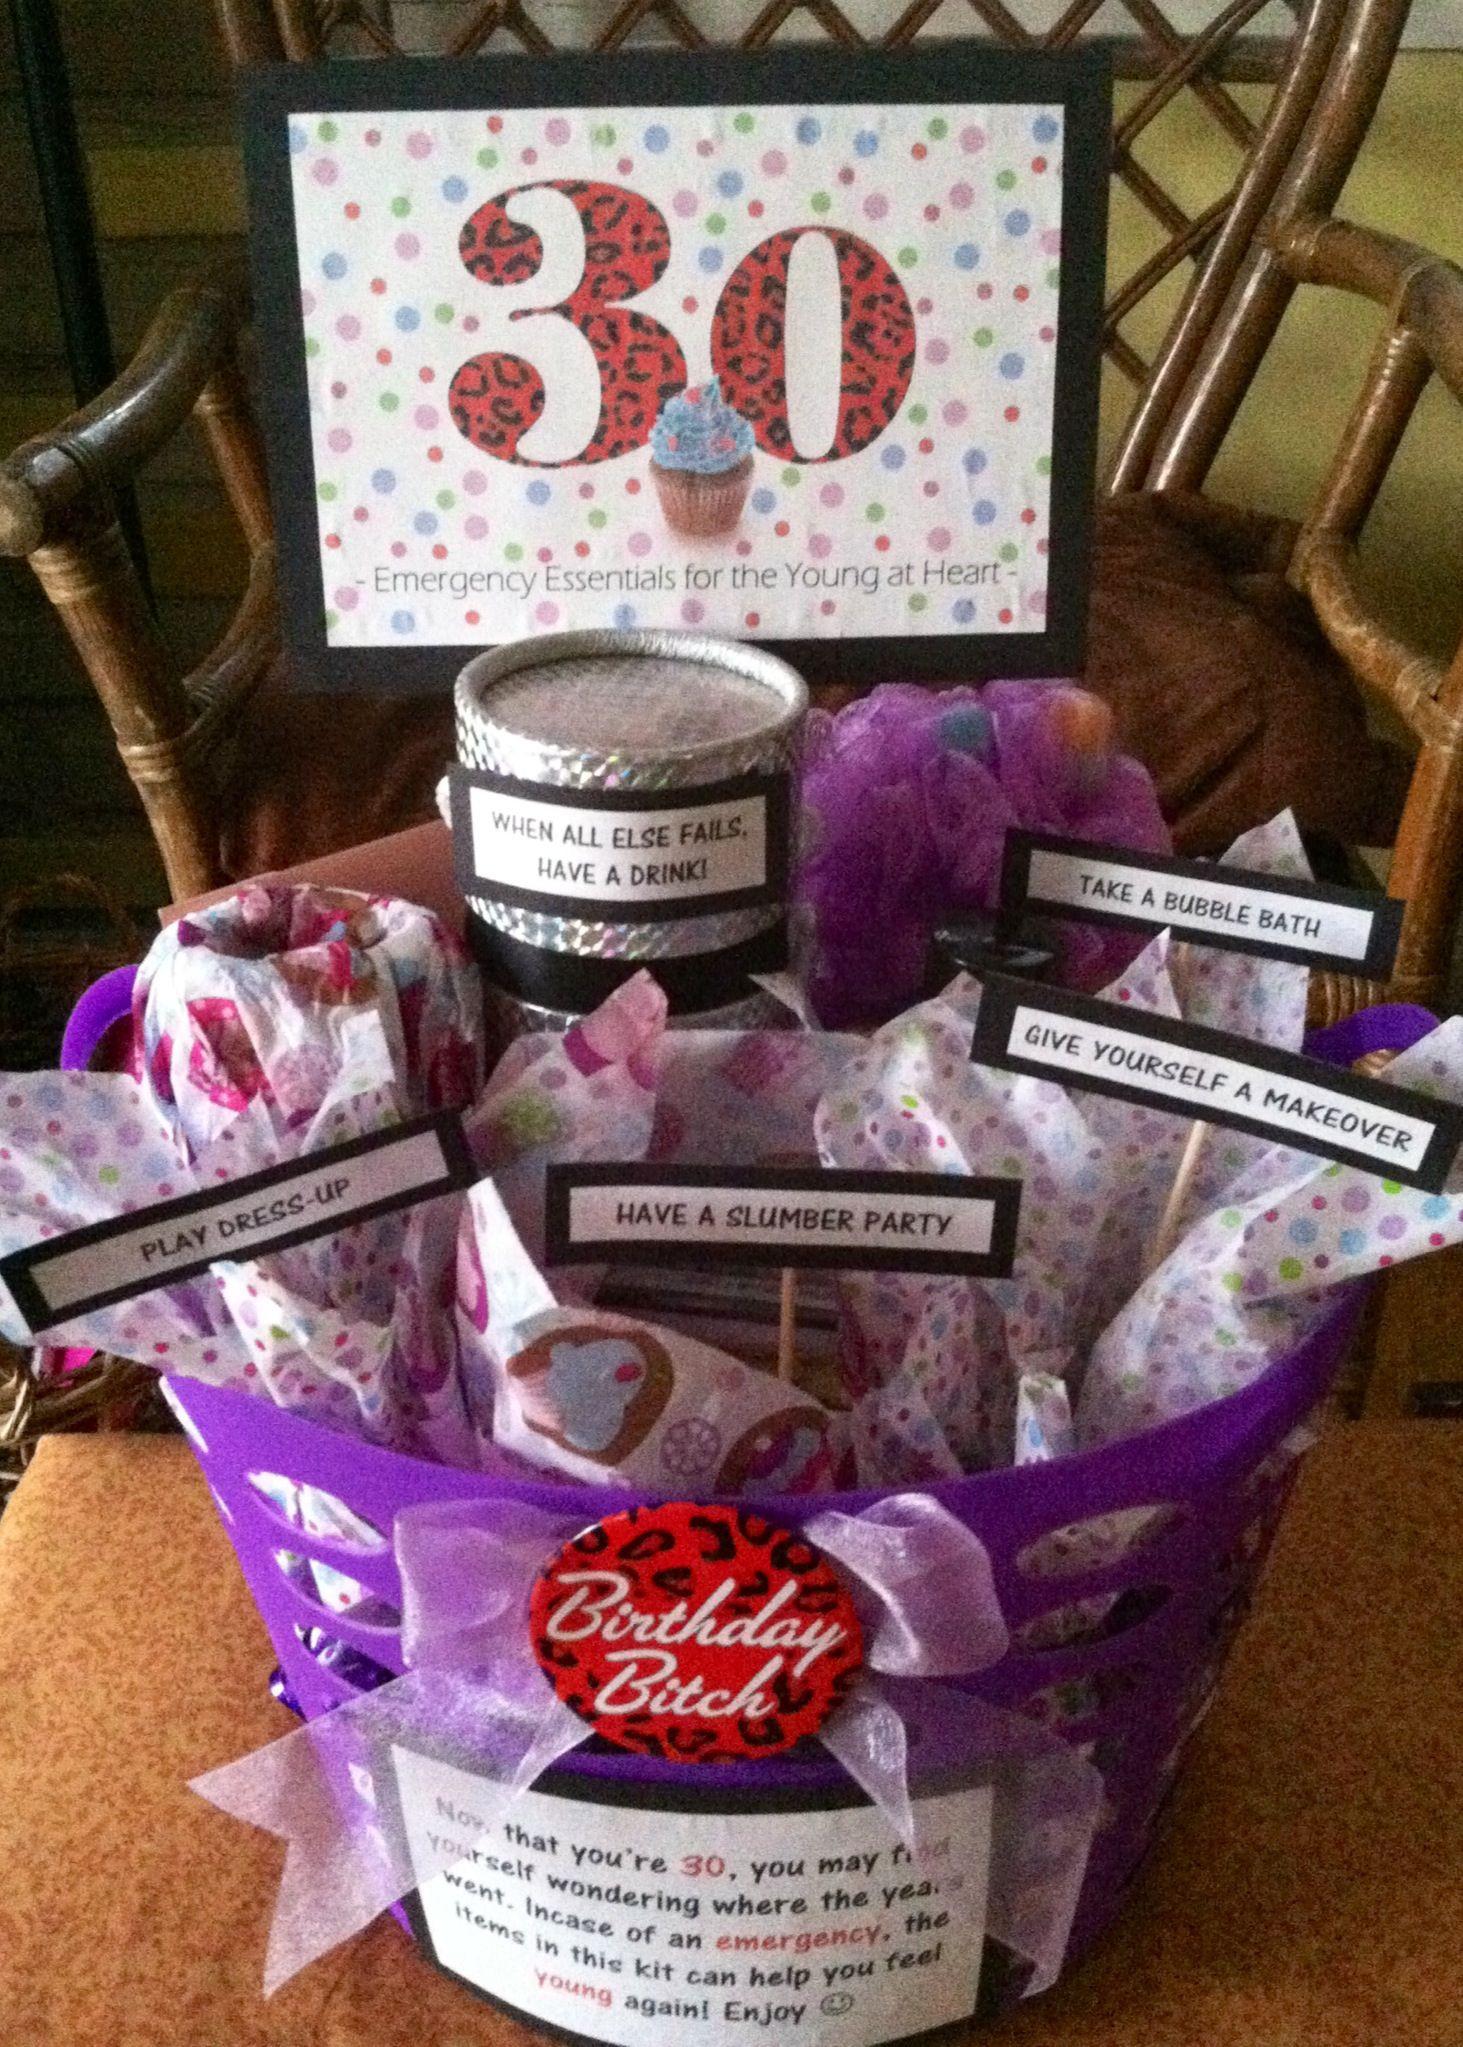 30Th Birthday Gift Ideas  30th Birthday Gift Basket 5 ts in 1 Emergency